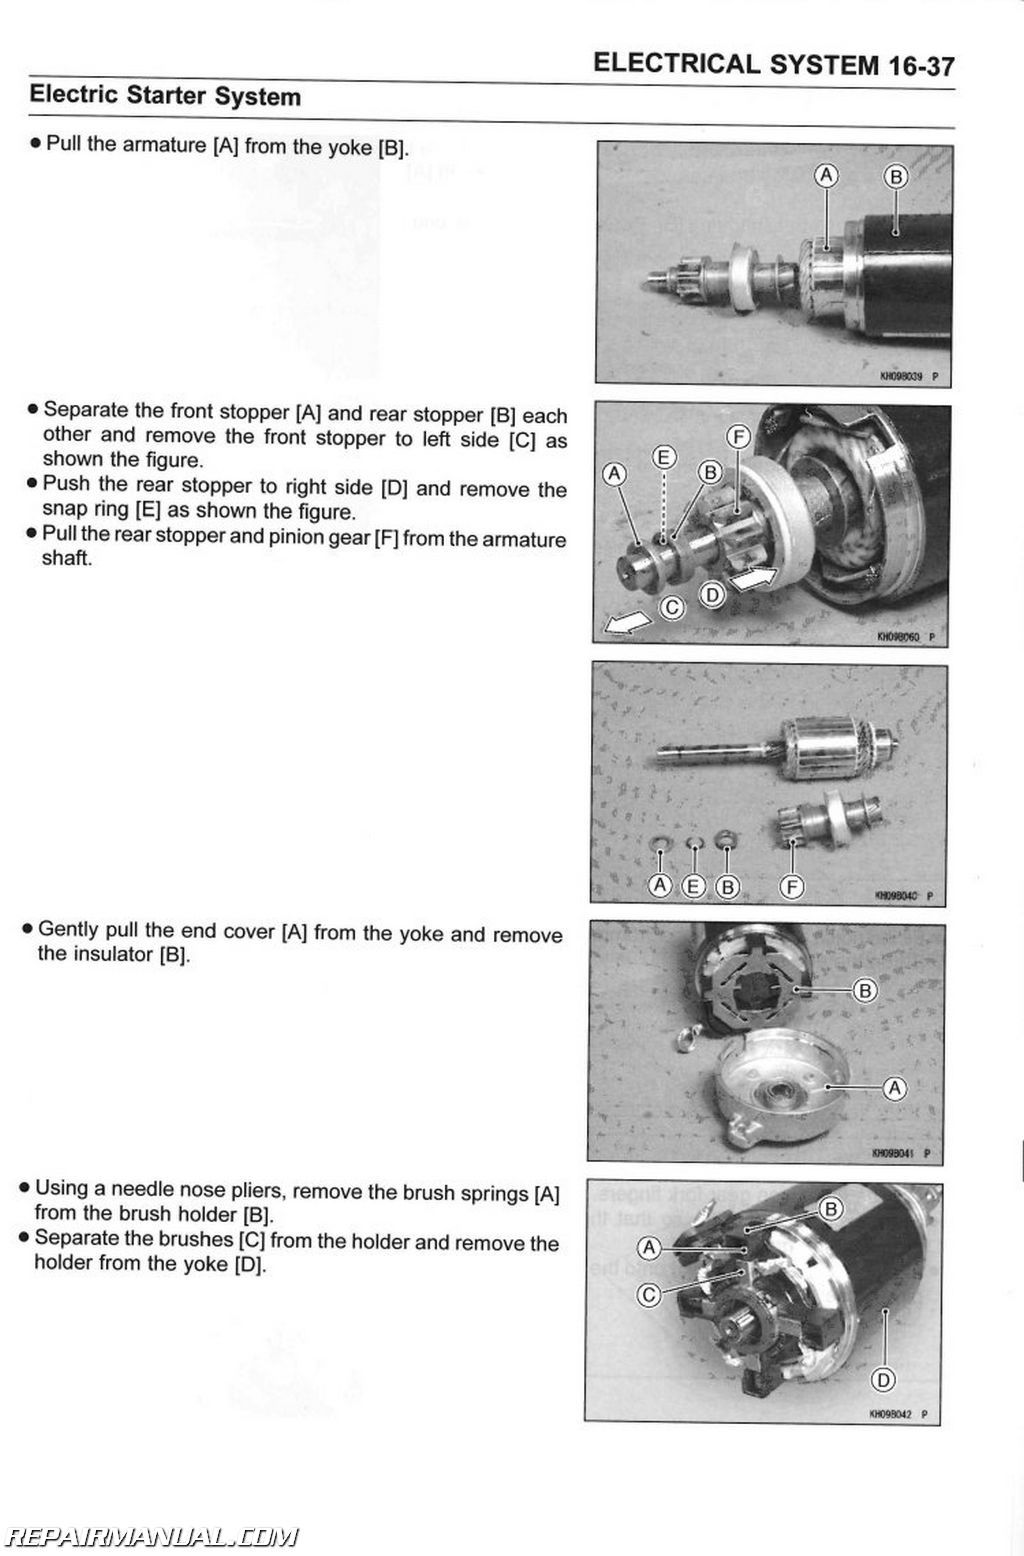 2006 kawasaki mule 3010 wiring diagram fender stratocaster 5 way switch 2005 2016 kaf400 utv 610 44 600 service manual